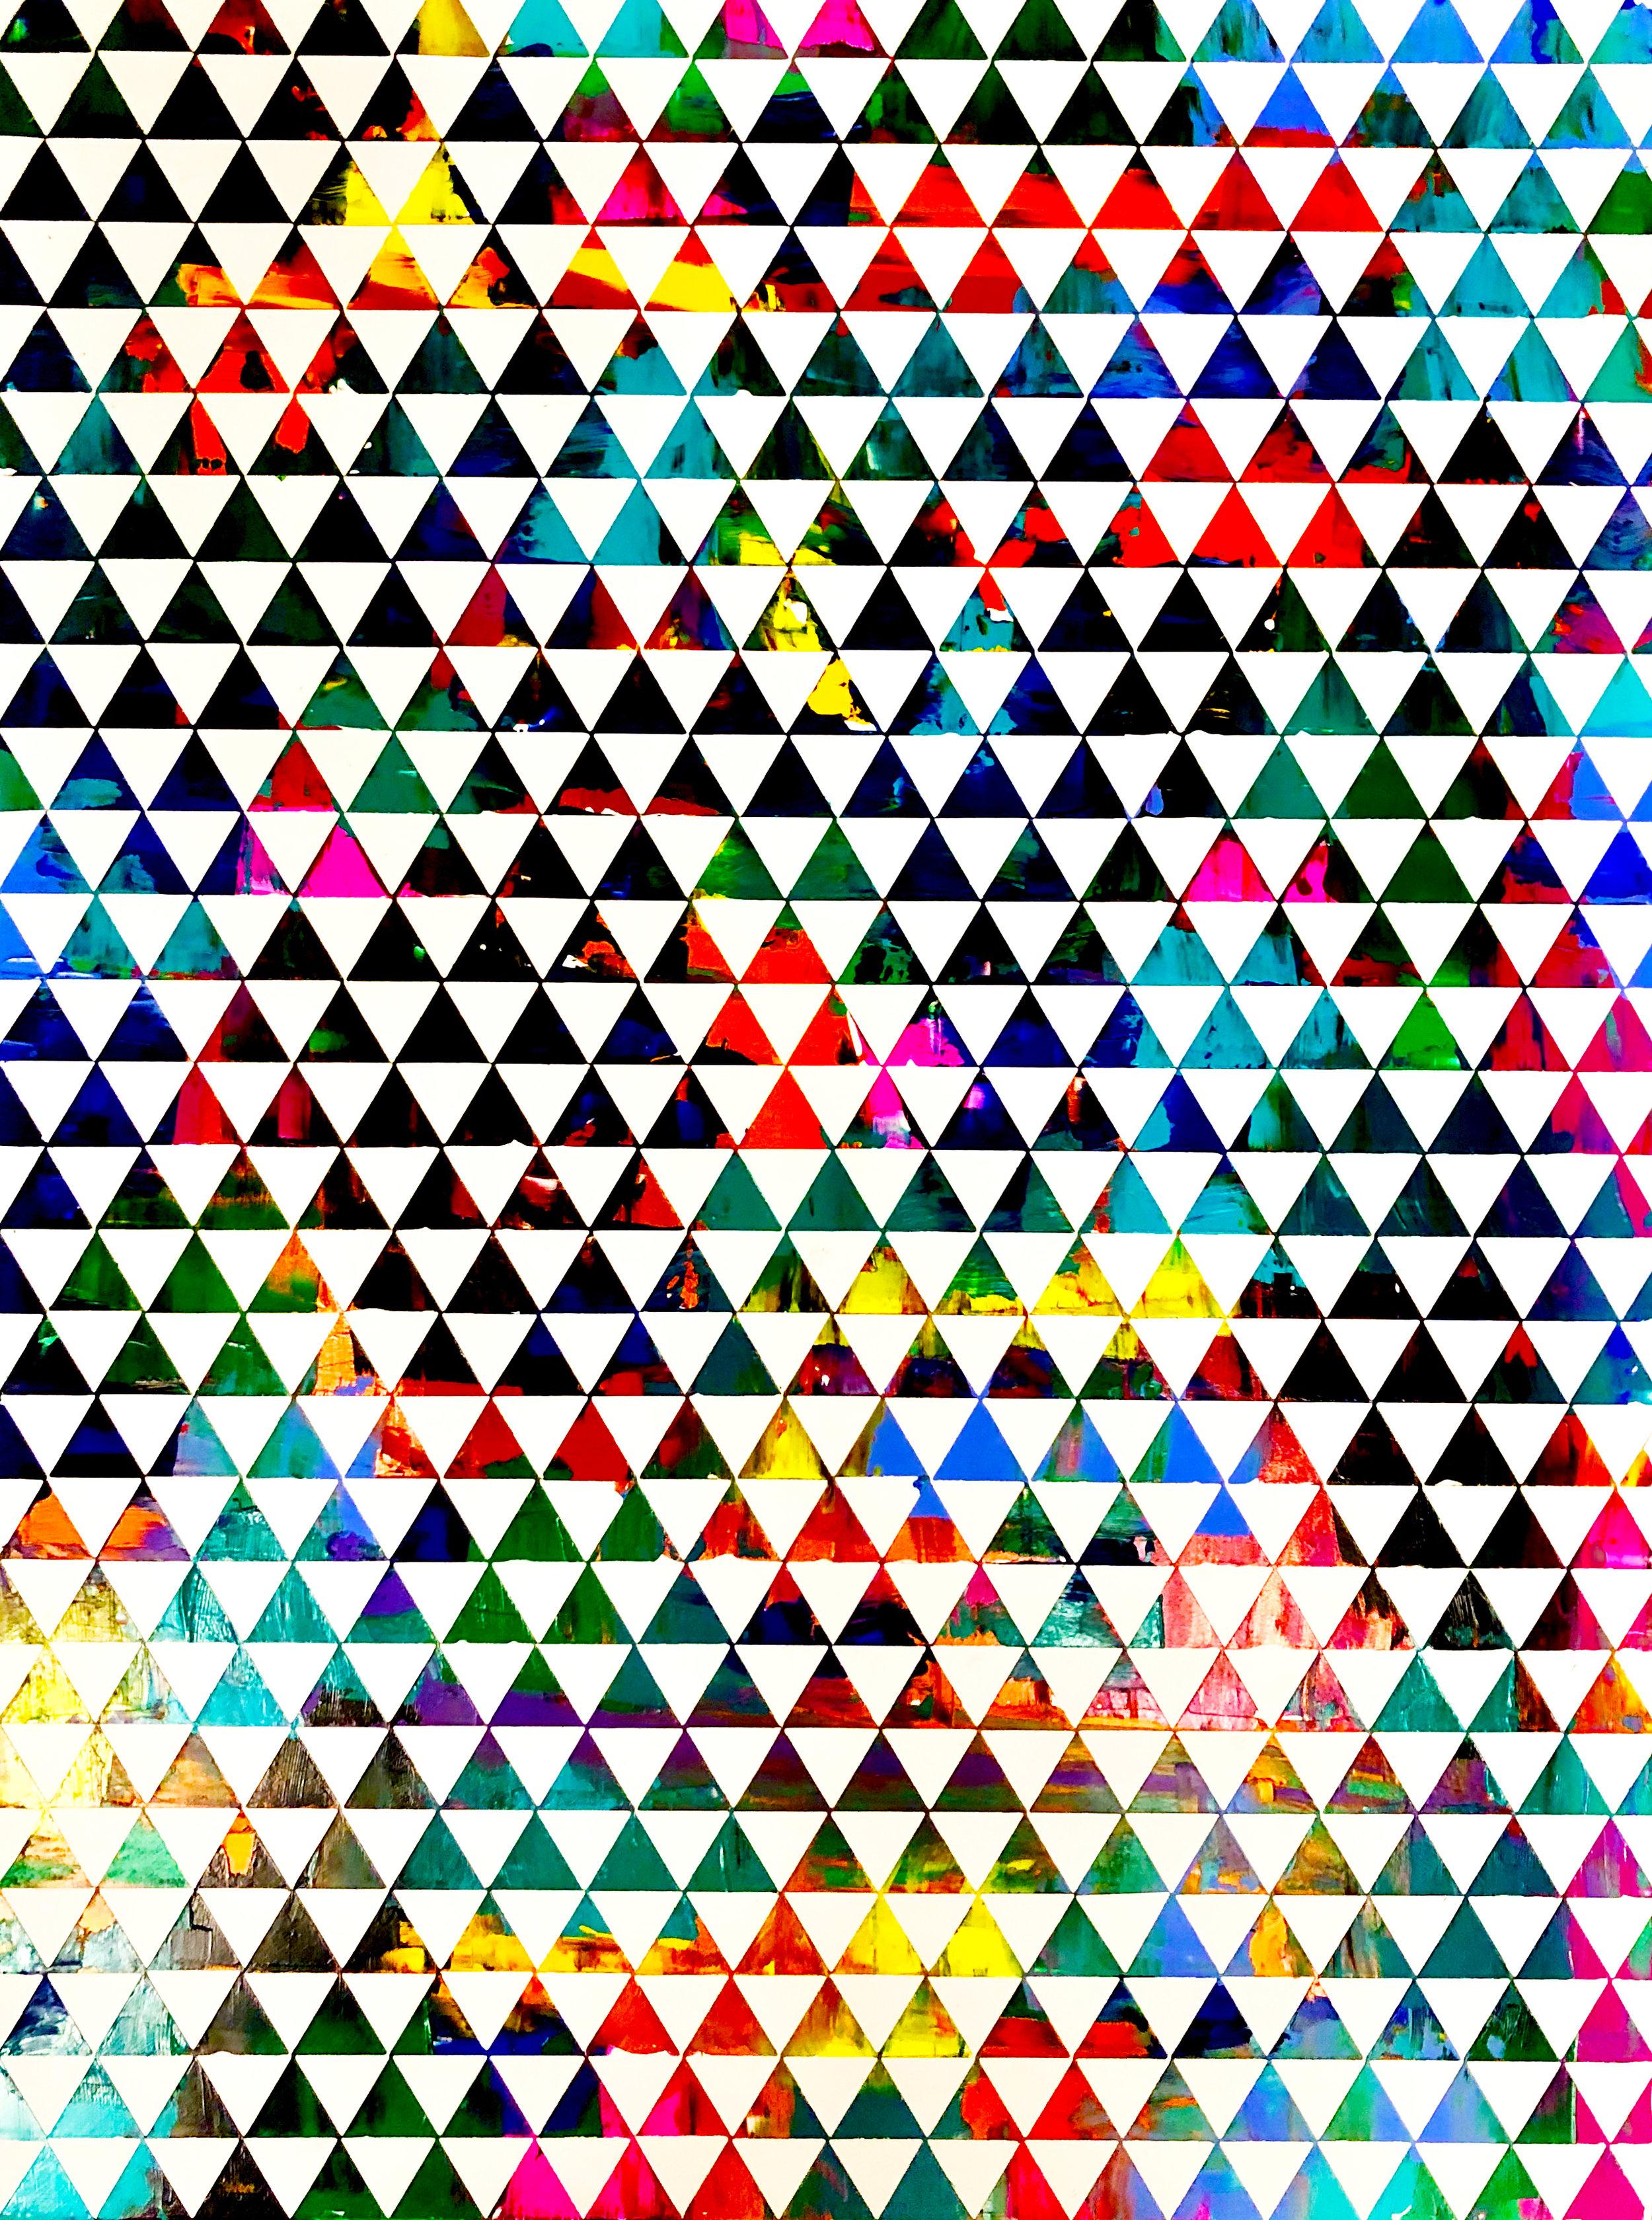 HUE Gallery of Contemporary Art - Sean Christopher Ward - Triangulation - Acrylic on MDF - 12x16 - 2018 - $375.JPG